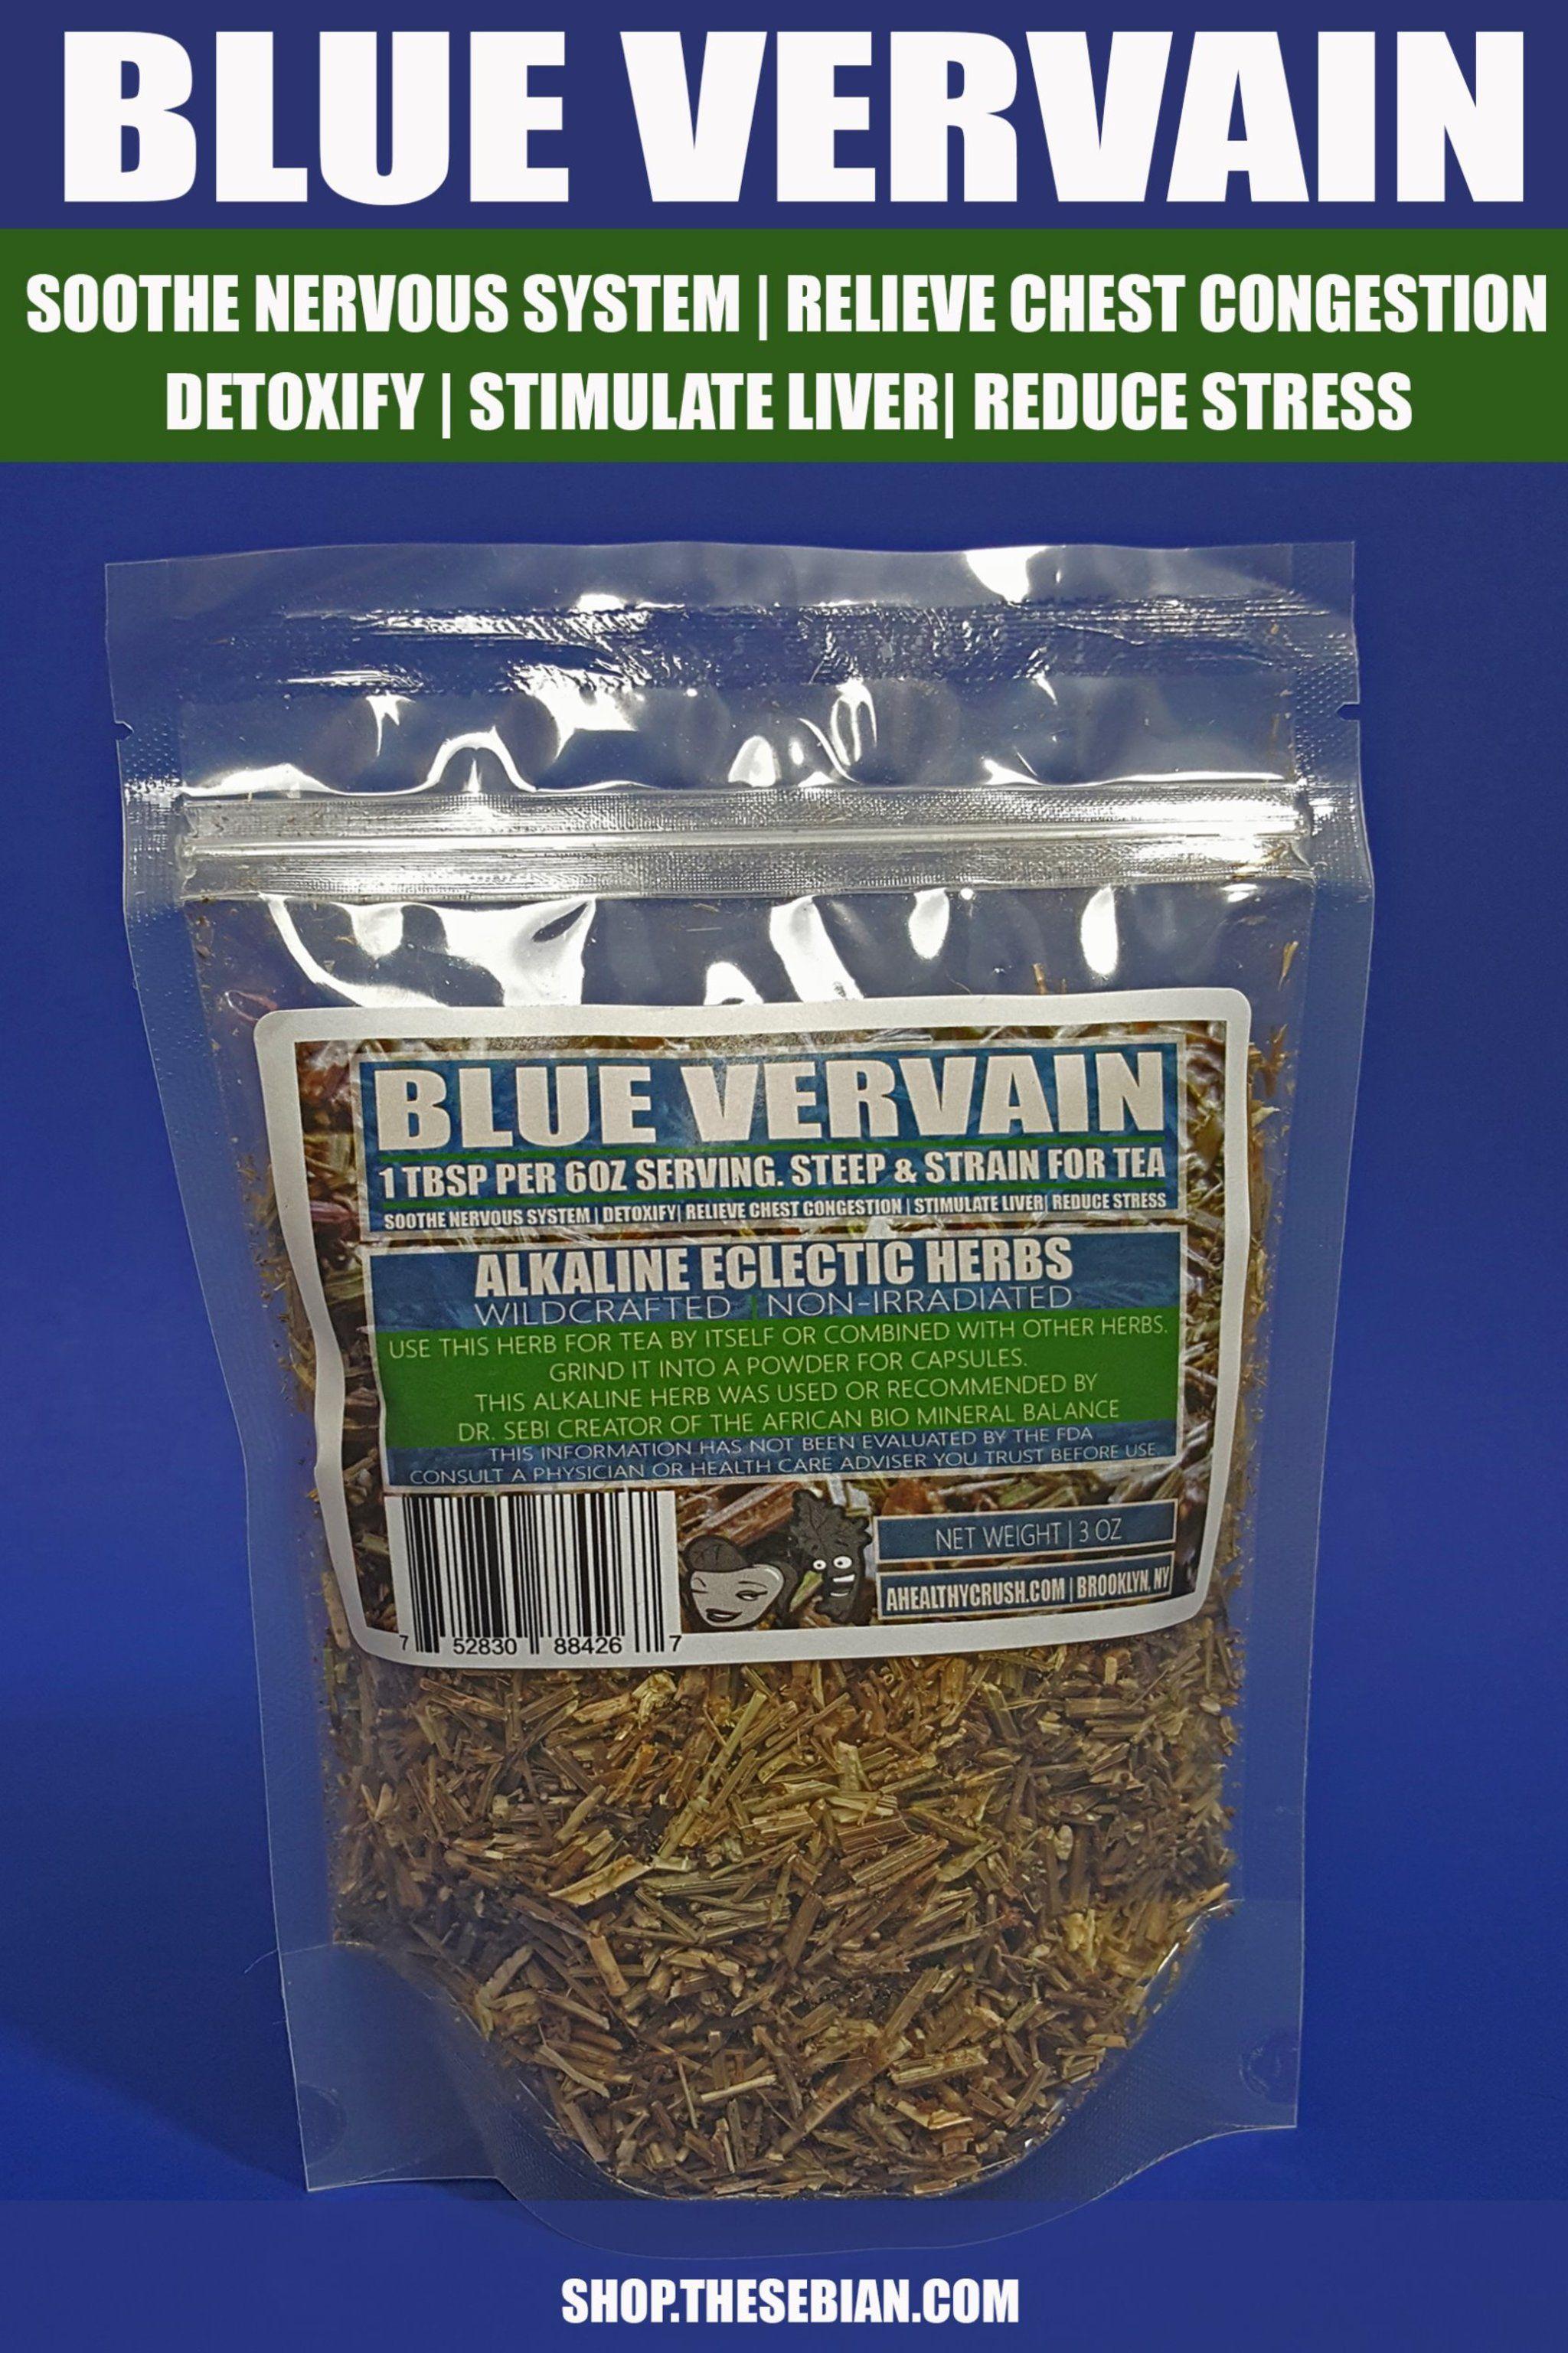 Alkaline herbs | GERARD1 | Herbs, Natural diuretic, Alkaline foods